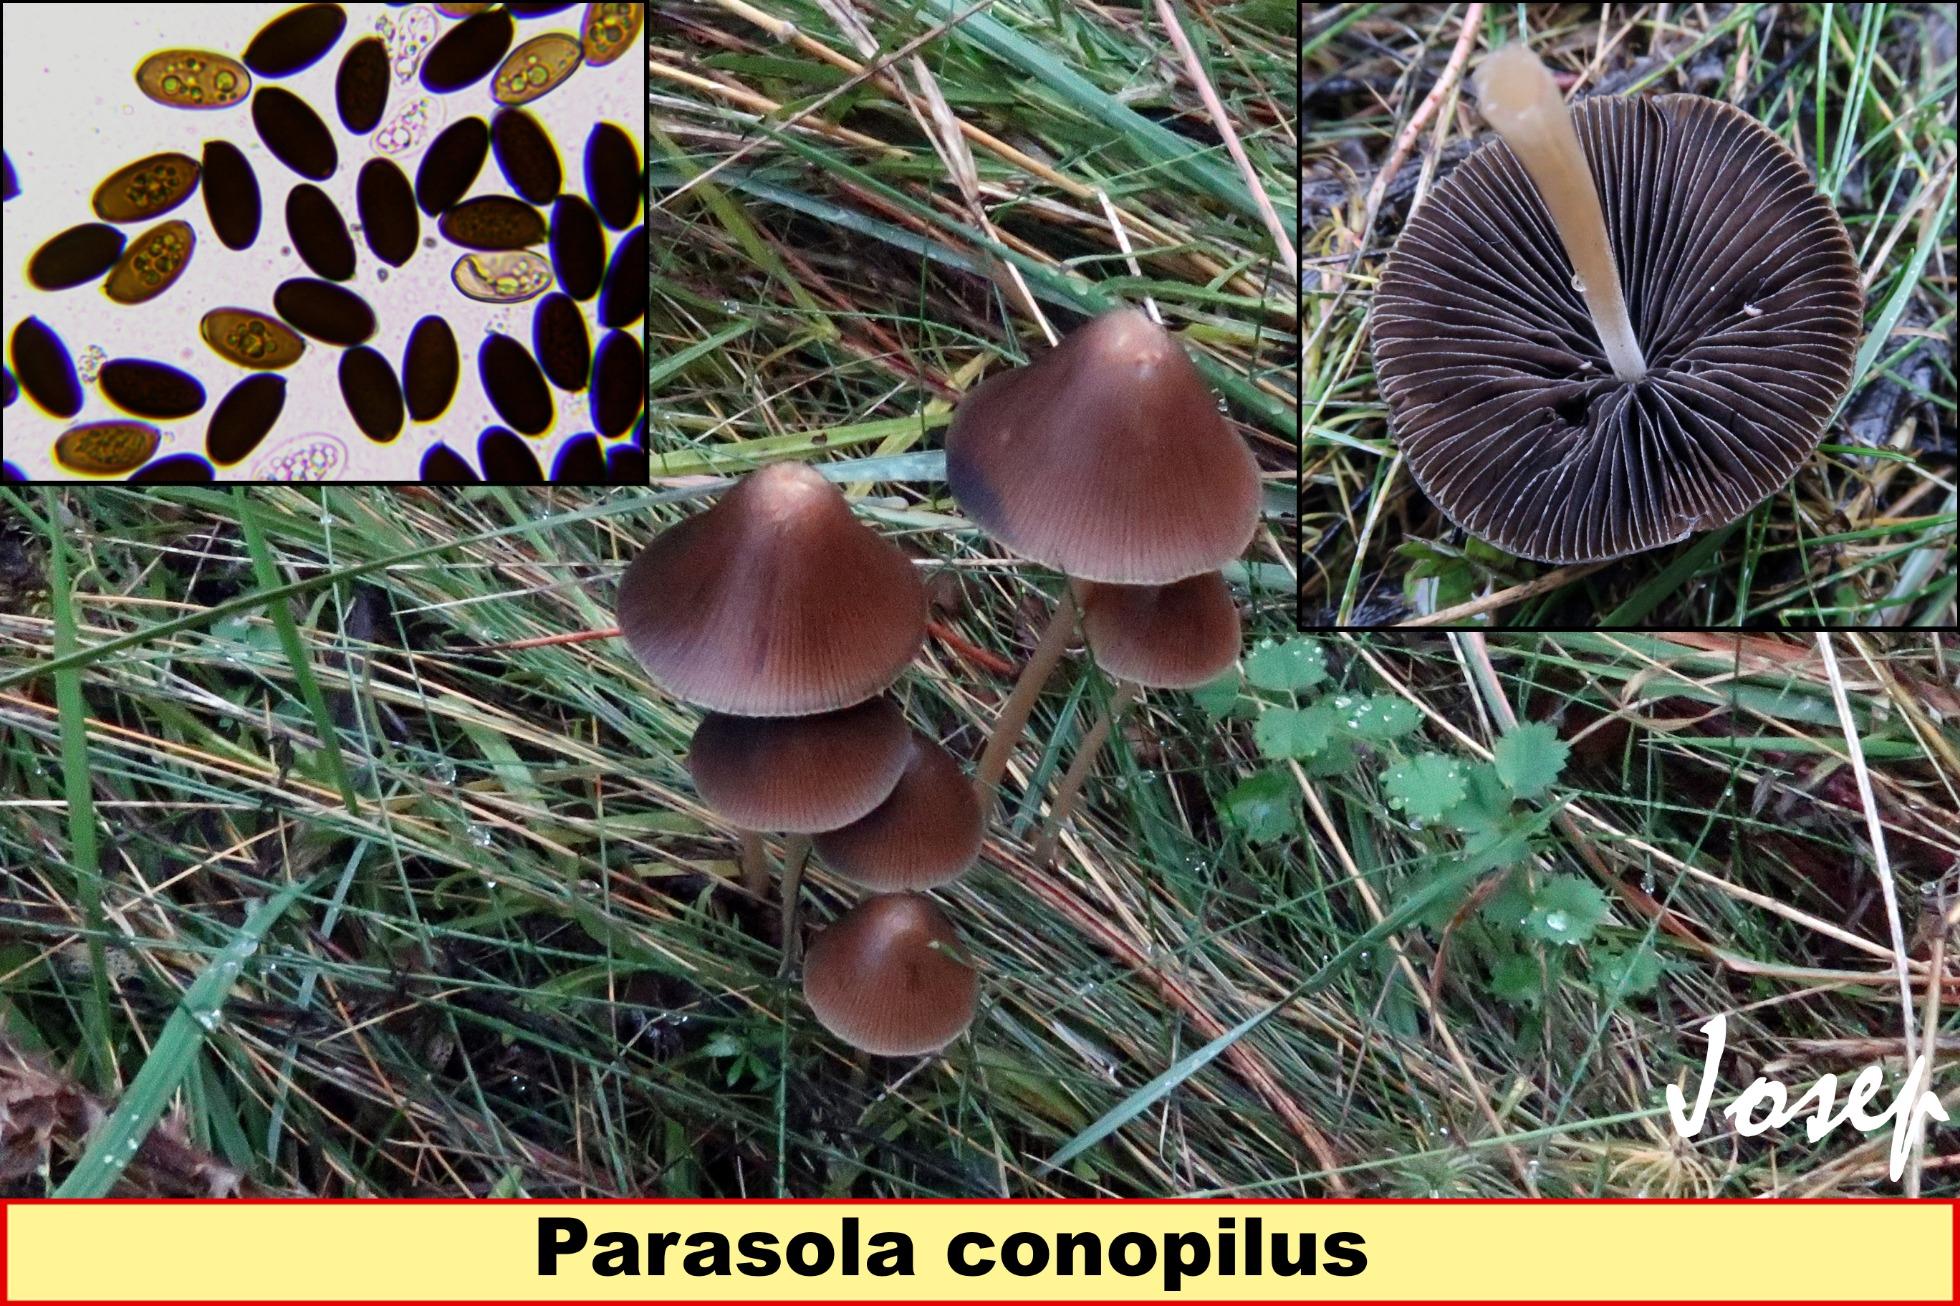 Parasolaconopilus_2019-01-20.jpg